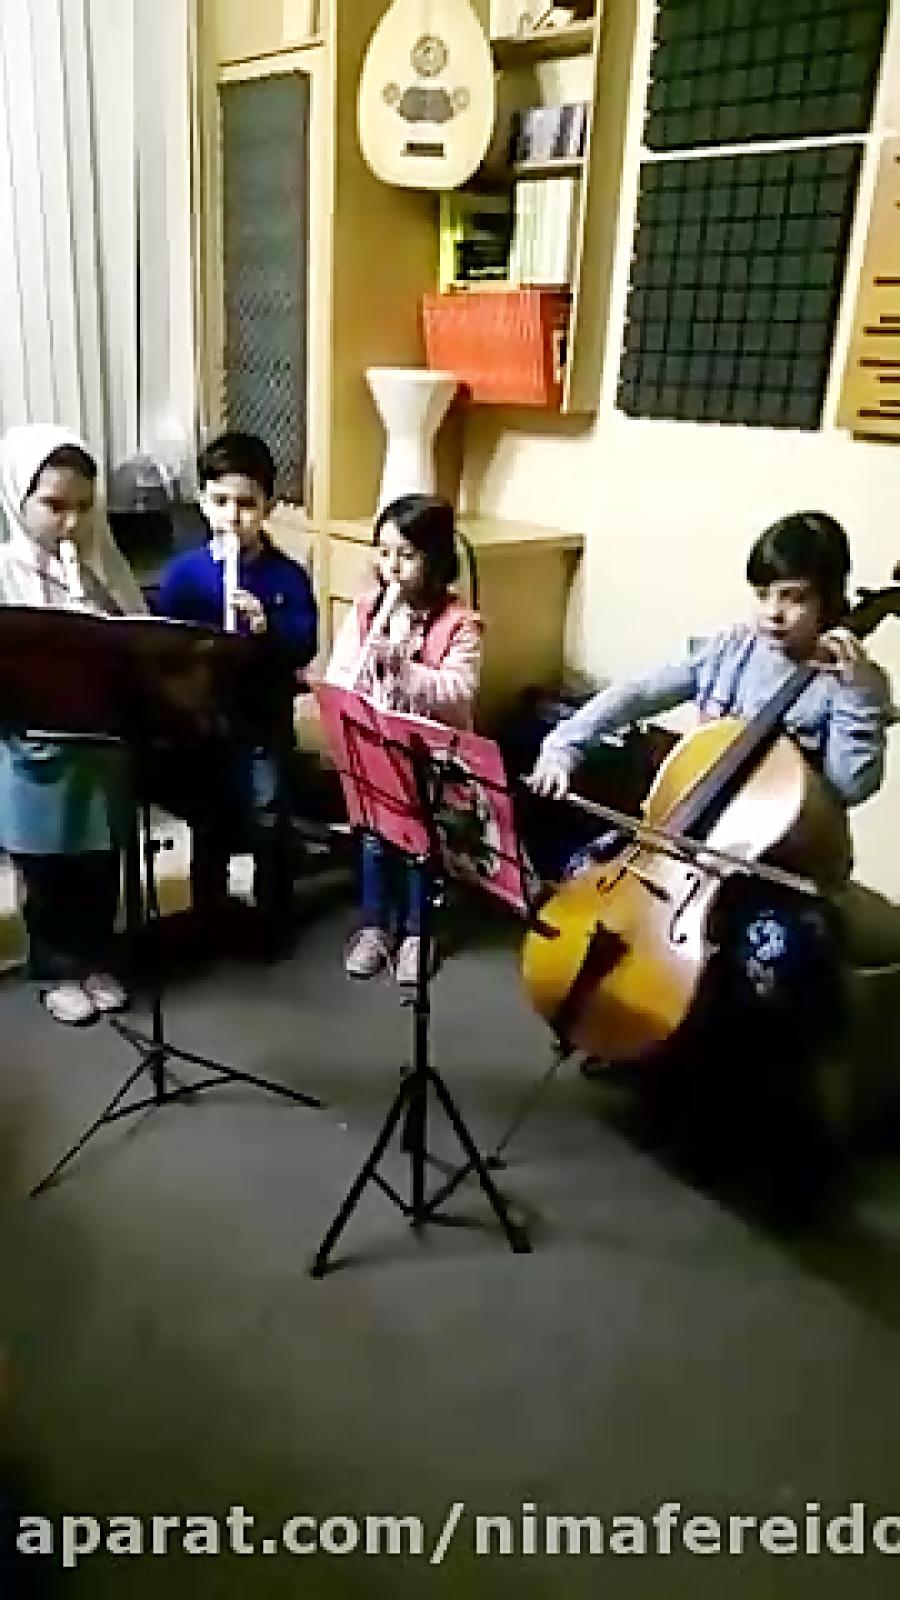 سپینود تاجیک ویولنسل مهرسا پرویزی صدرا اقبالی بهار مقبلی فلوت هنرجویان وحید وفايی مرجان کاشف